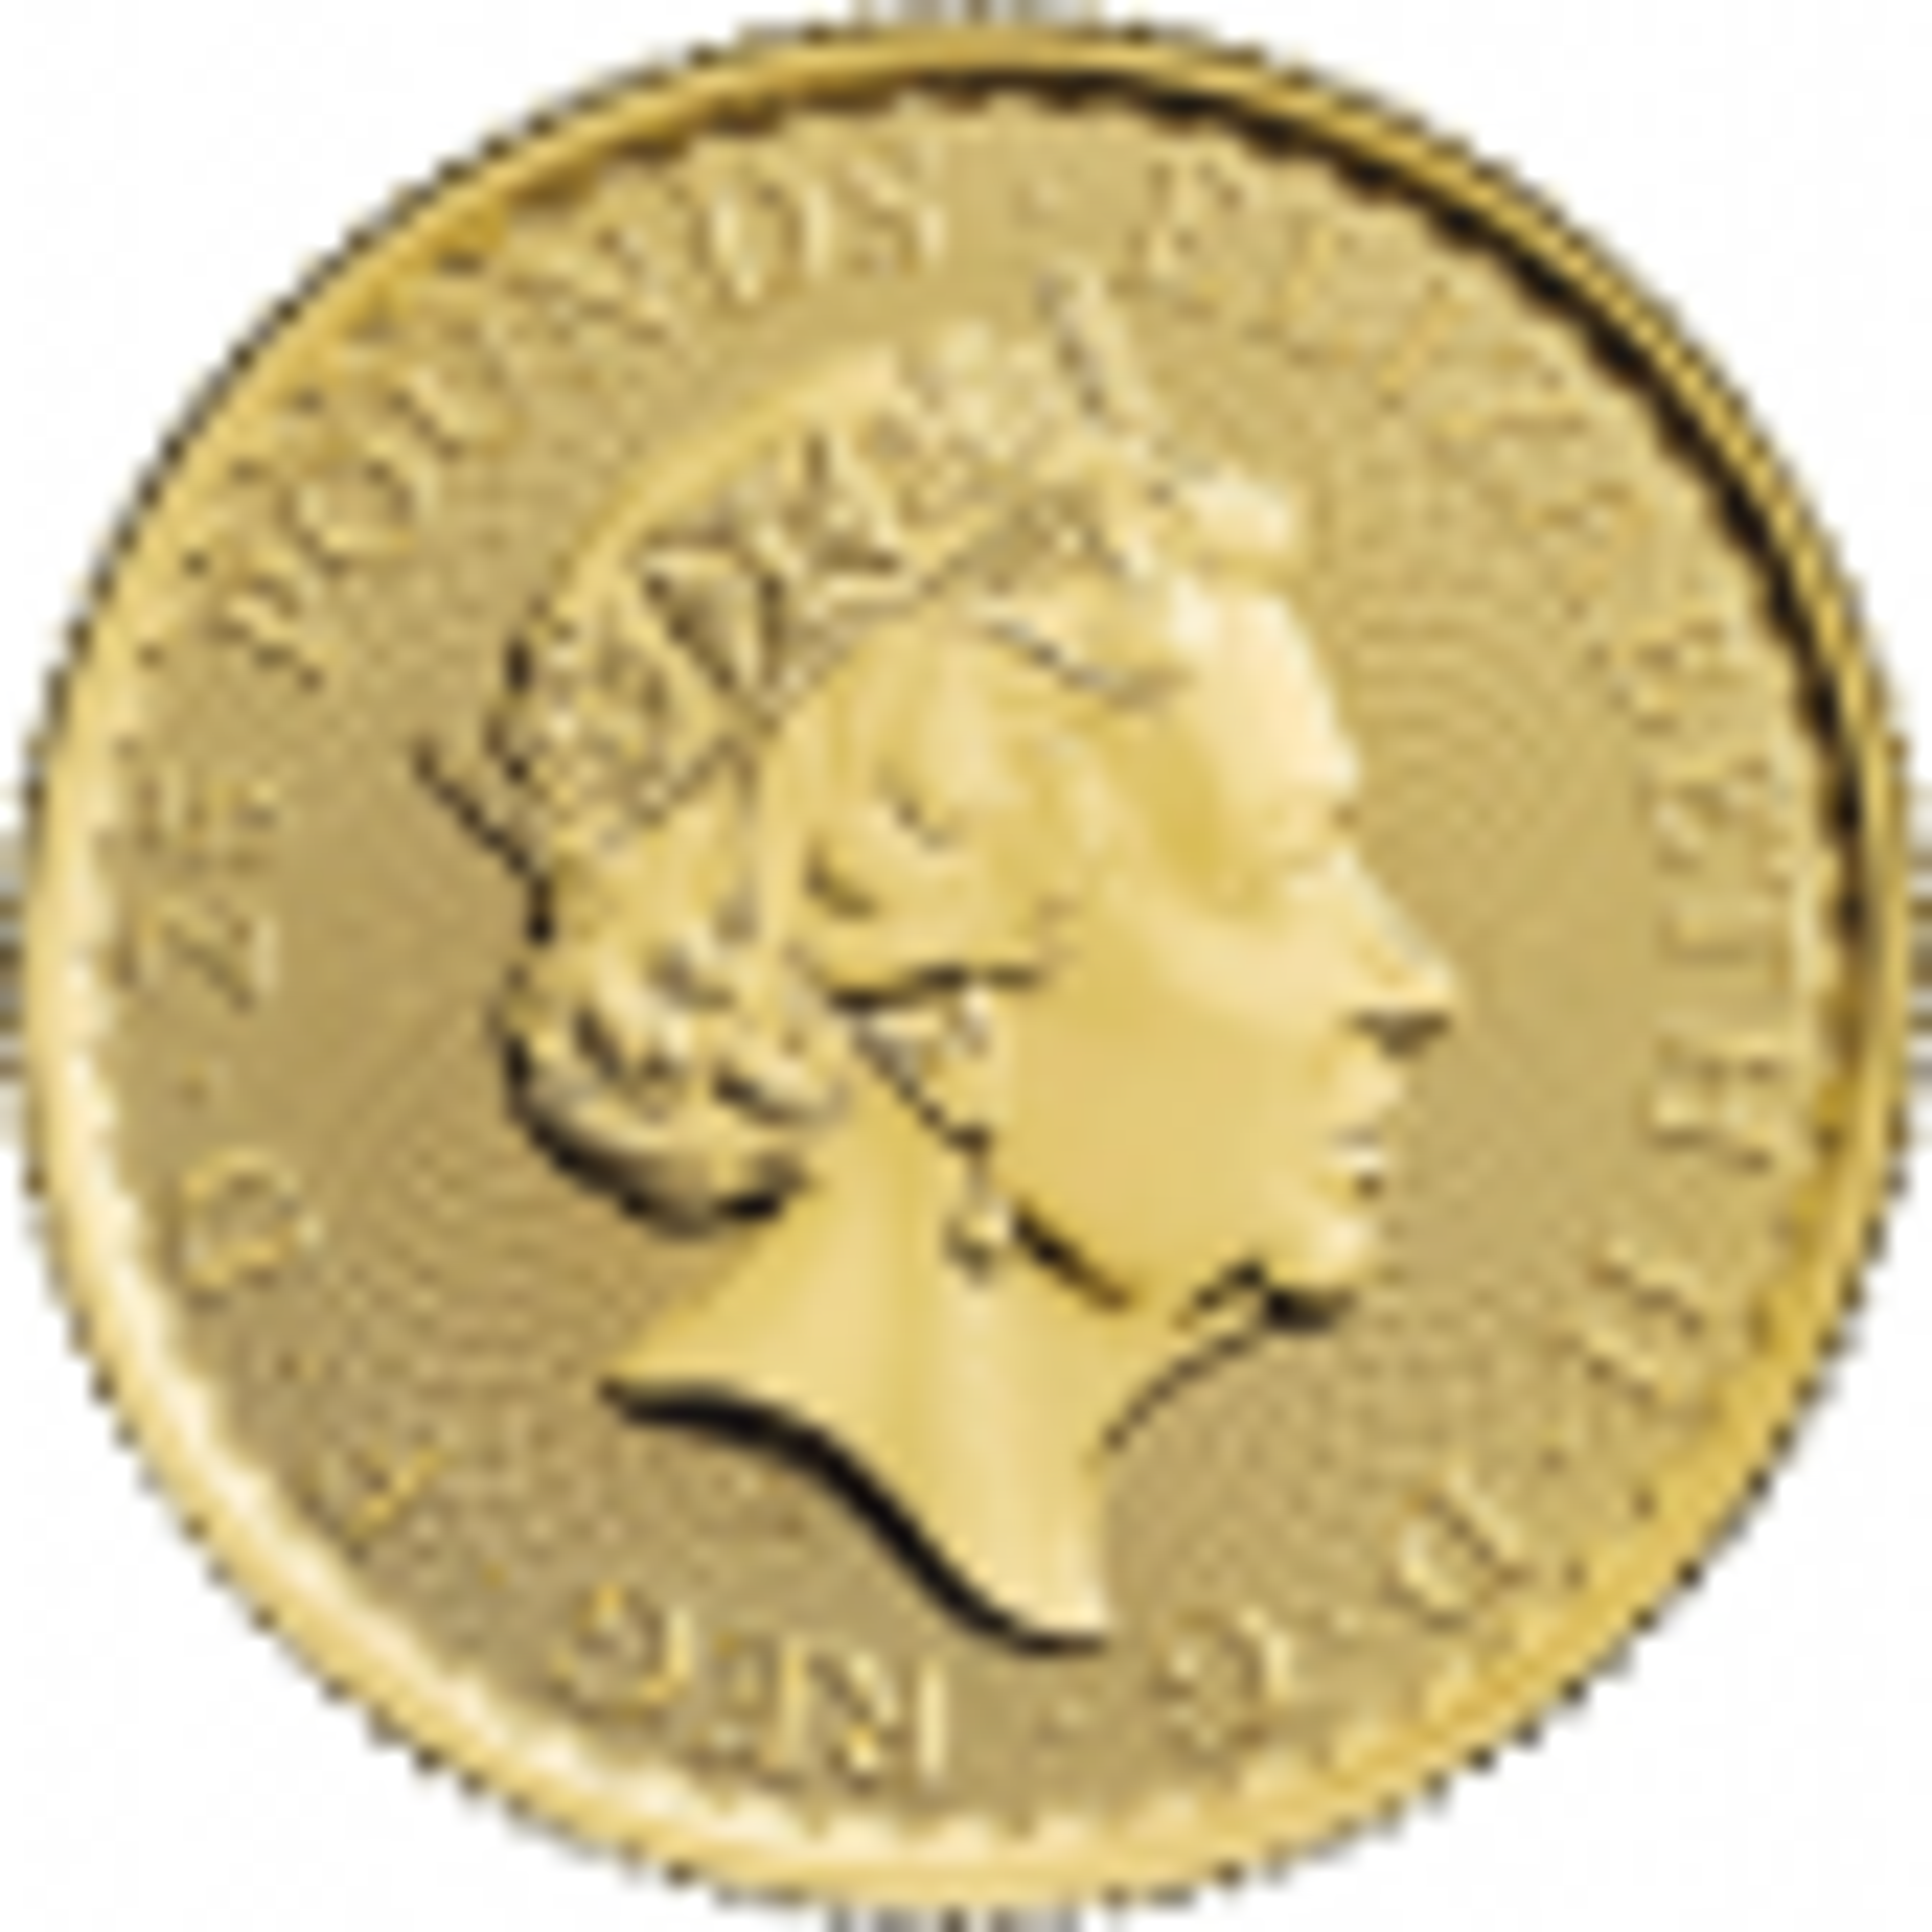 1/4 oz gold Britannia coin 2021